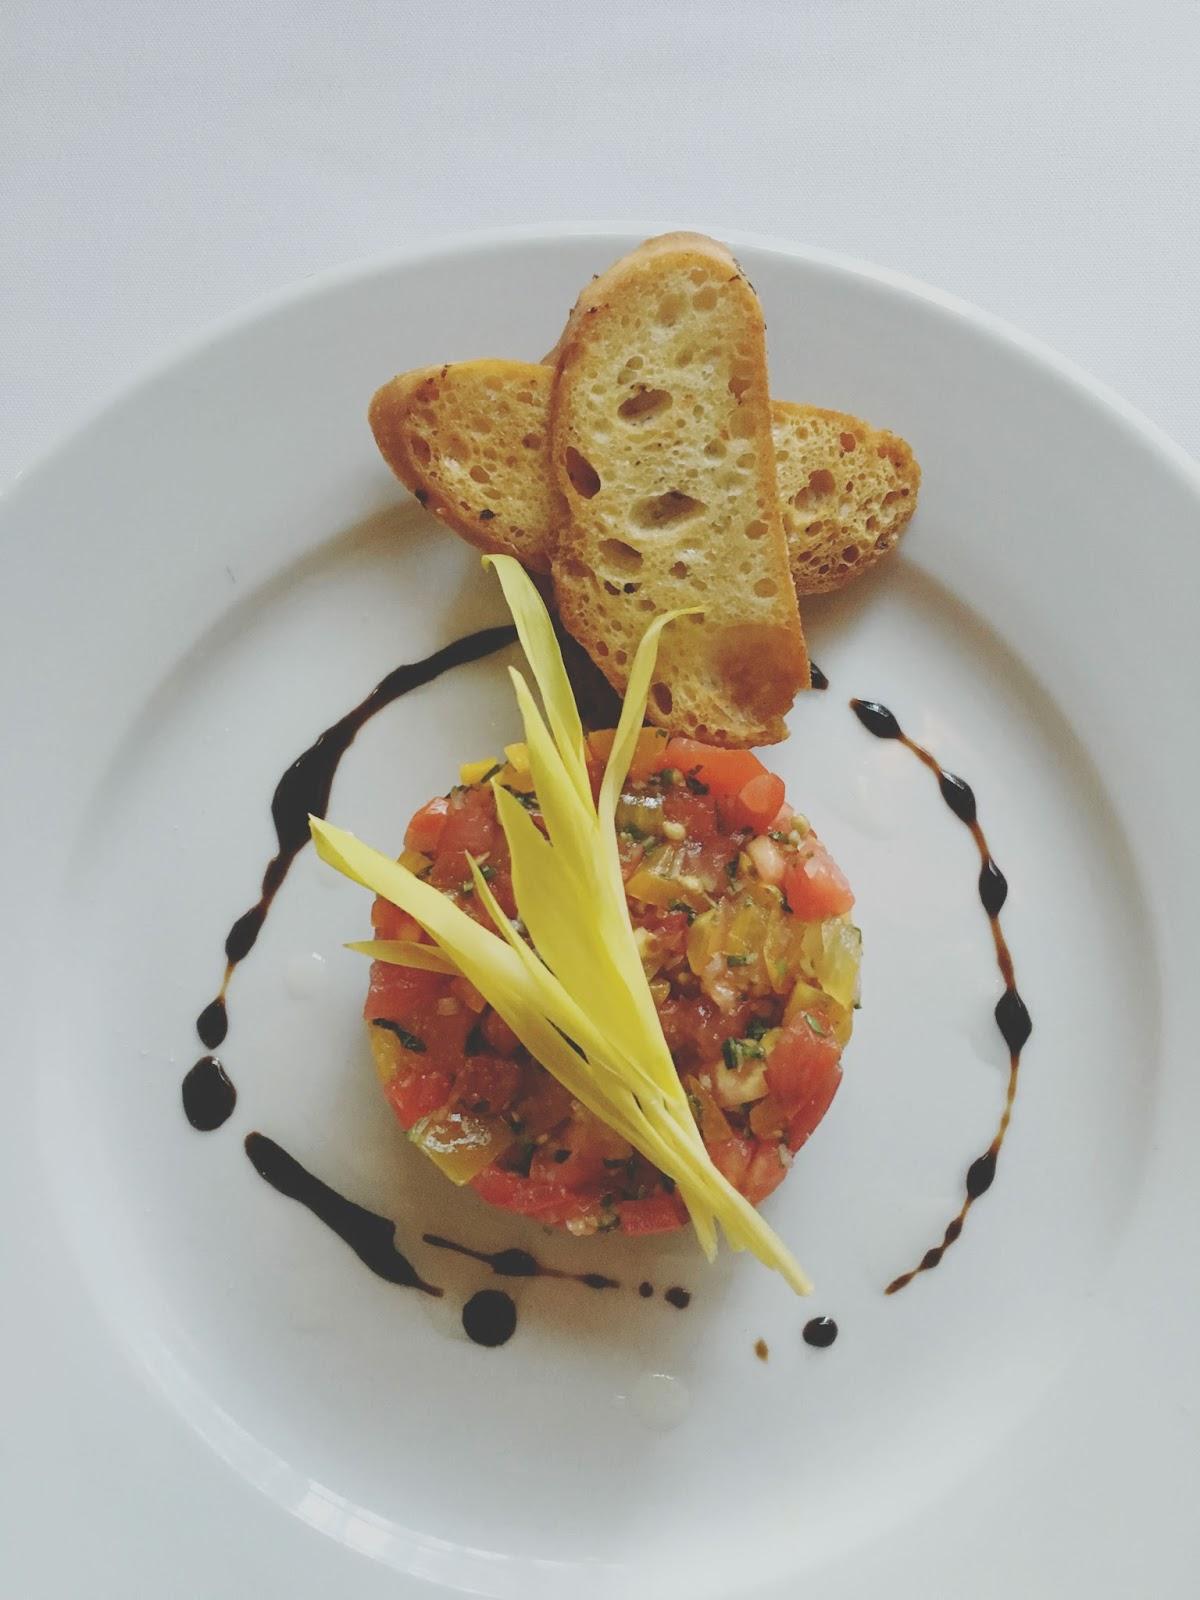 tomato tartare at Eddie V's - A restaurant in Houston, Texas